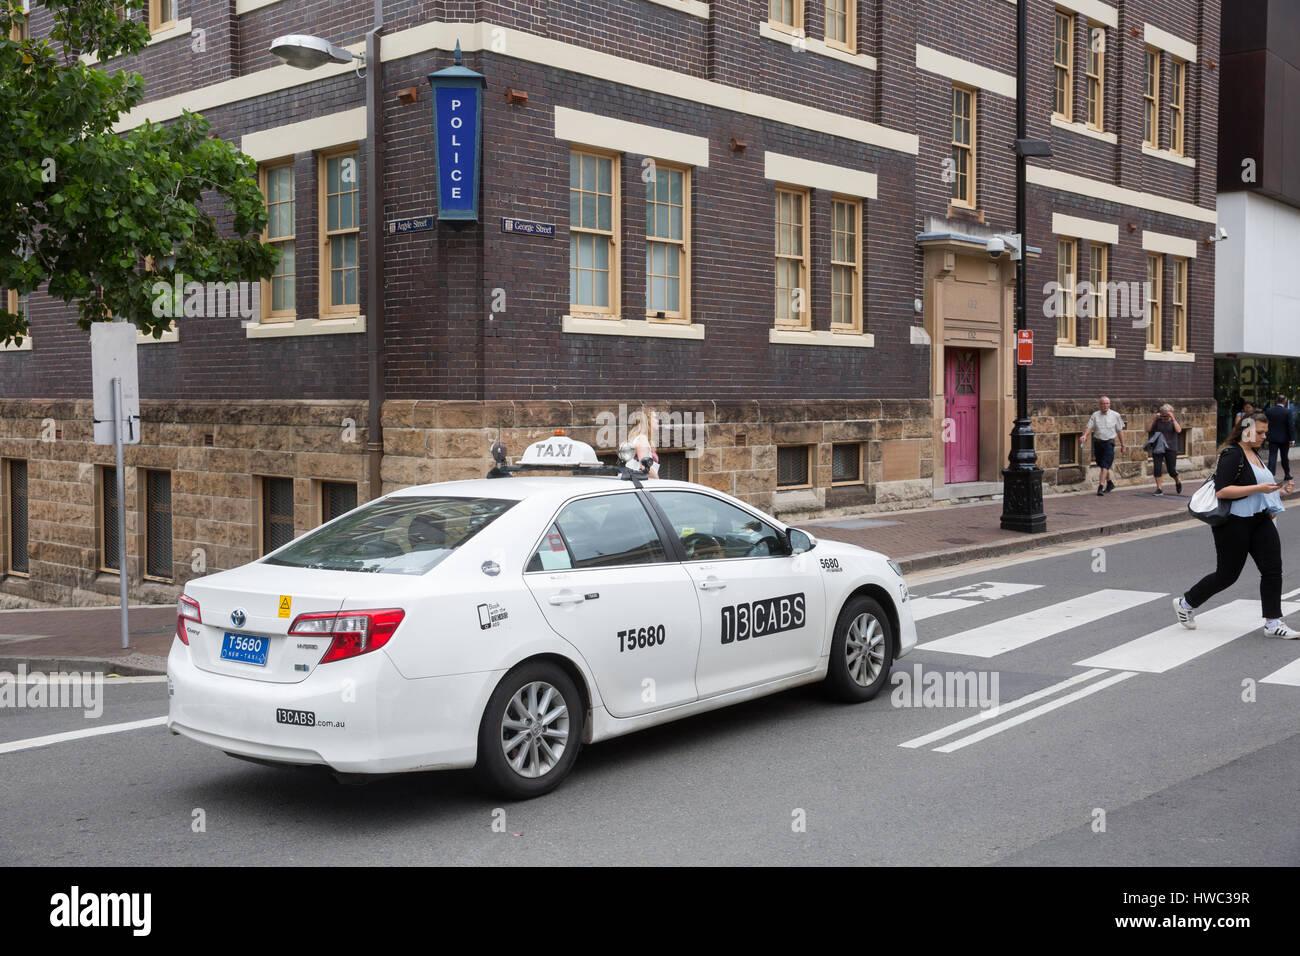 13 cabs sydney